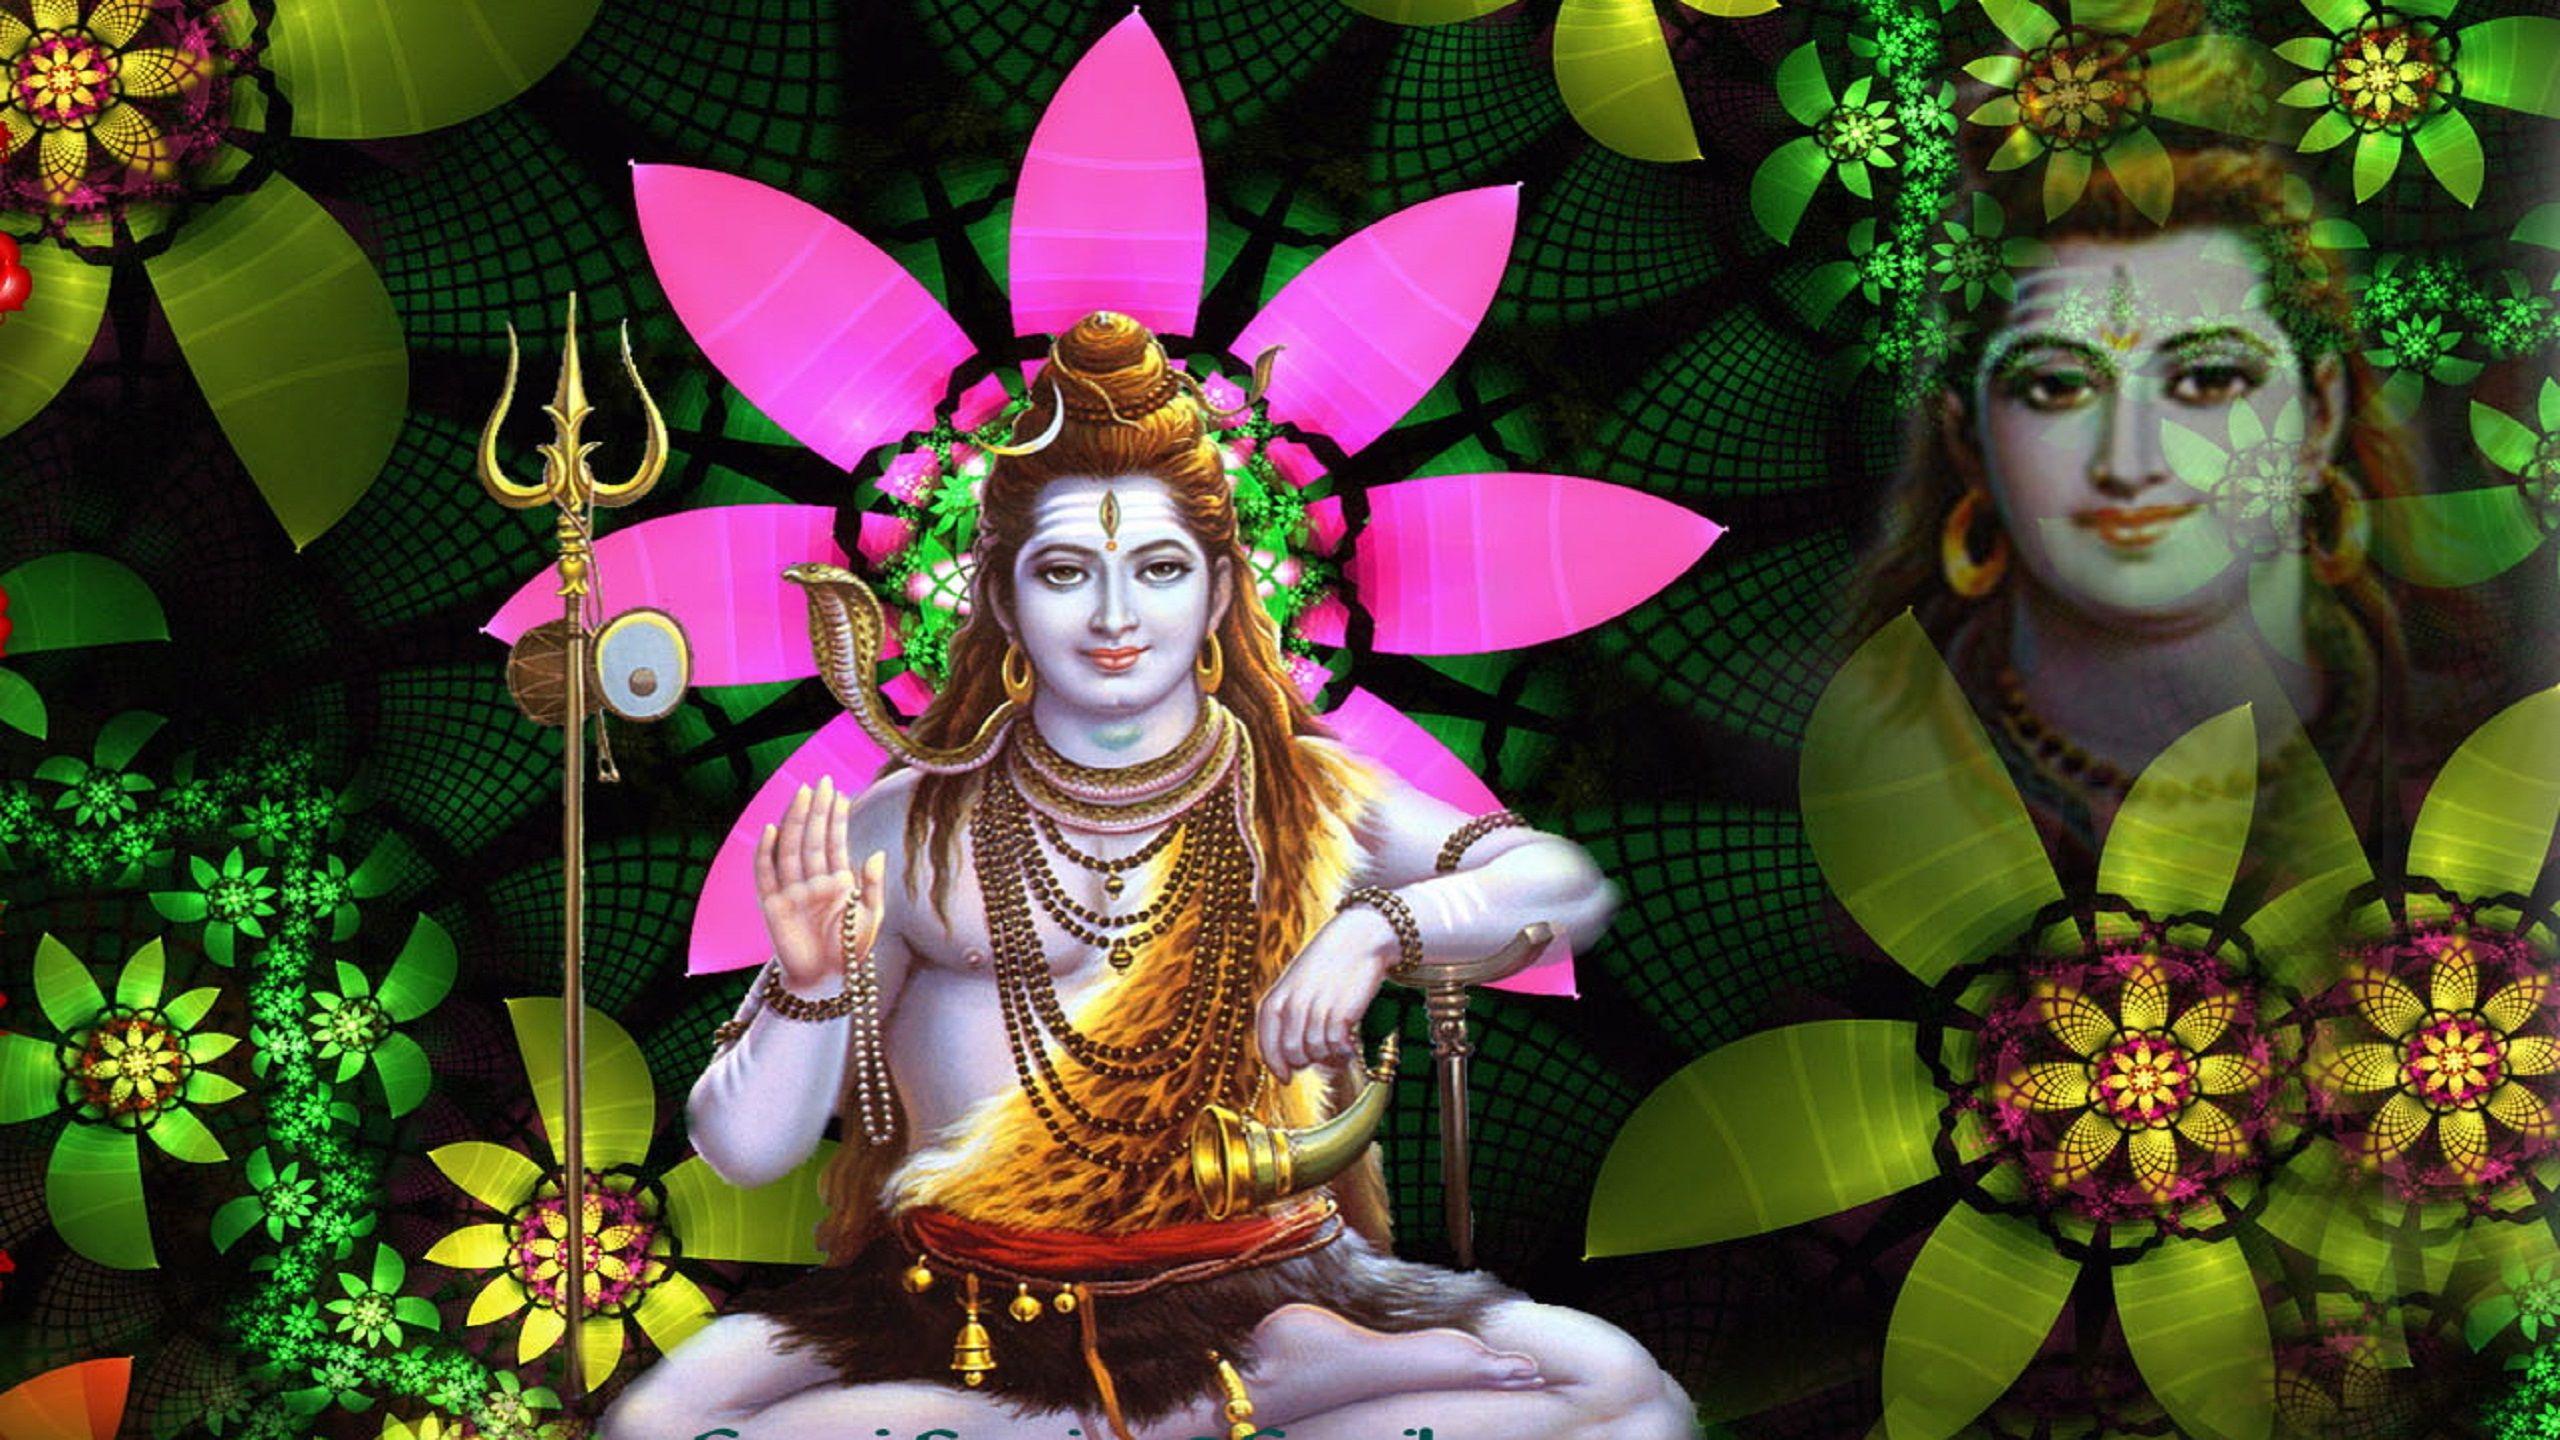 Good Wallpaper Lord Hindu - e3a1e4d220b51b8e4ff7ffbd4f7c067c  Image_80331.jpg